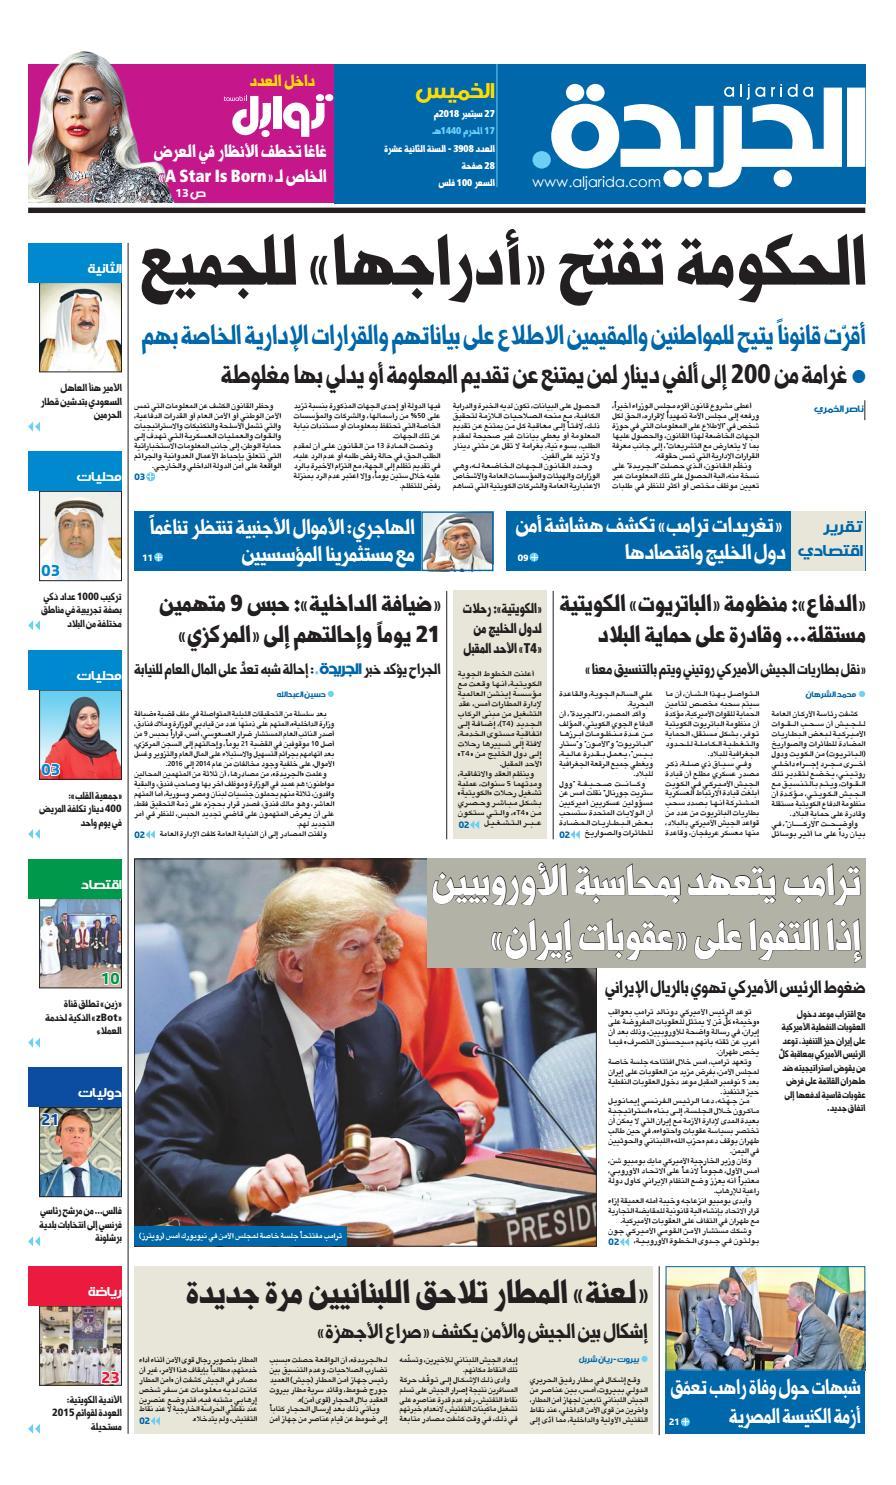 fd5c690e1 عدد الجريدة 27 سبتمبر 2018 by Aljarida Newspaper - issuu